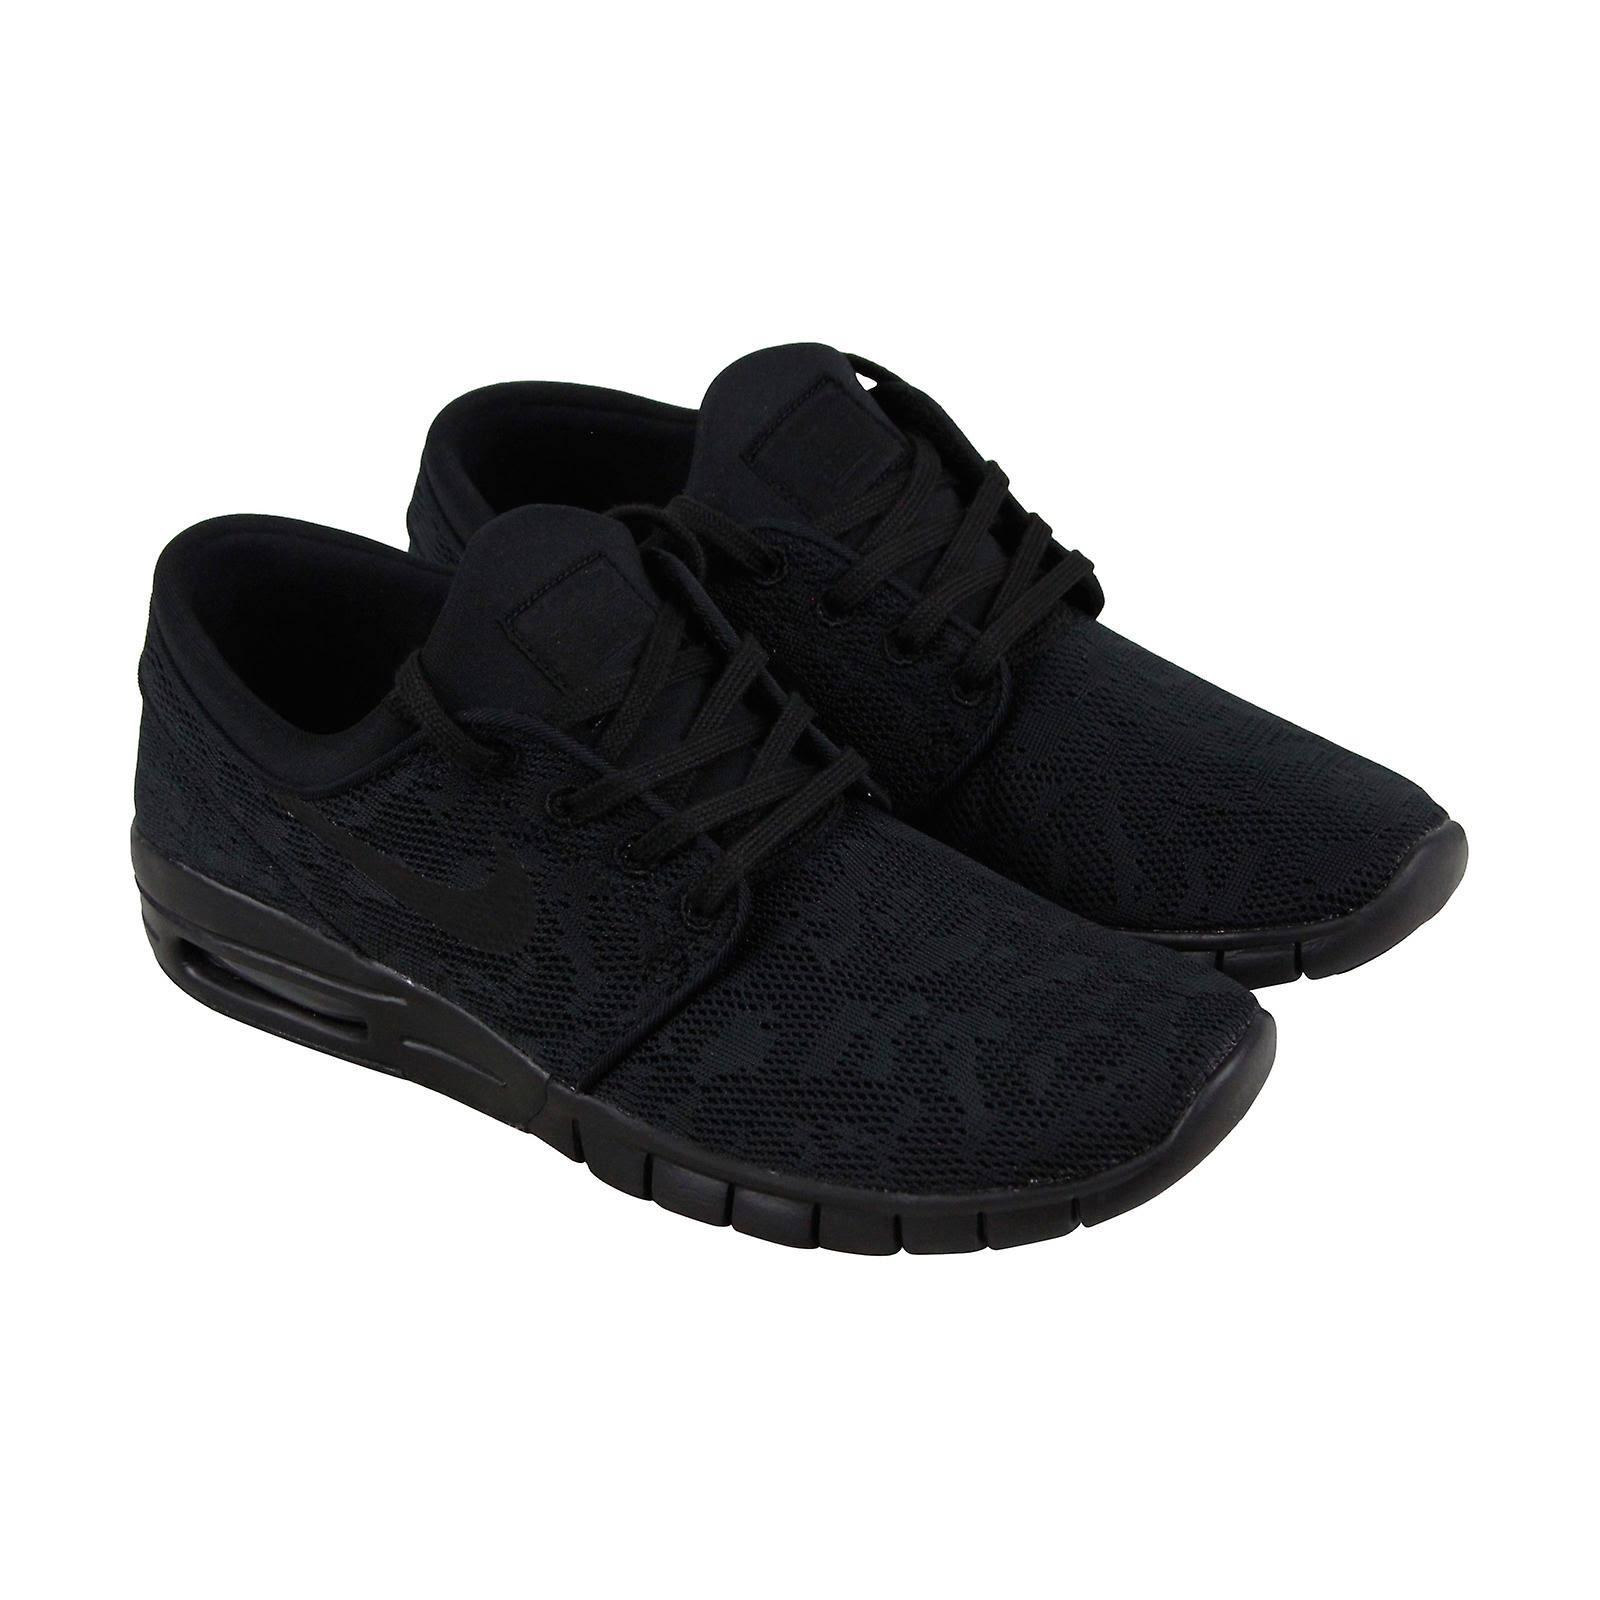 Max Janoski Stefan Men's Black Skateboarding Sb Shoe Anthracite Nike qEaw5txE